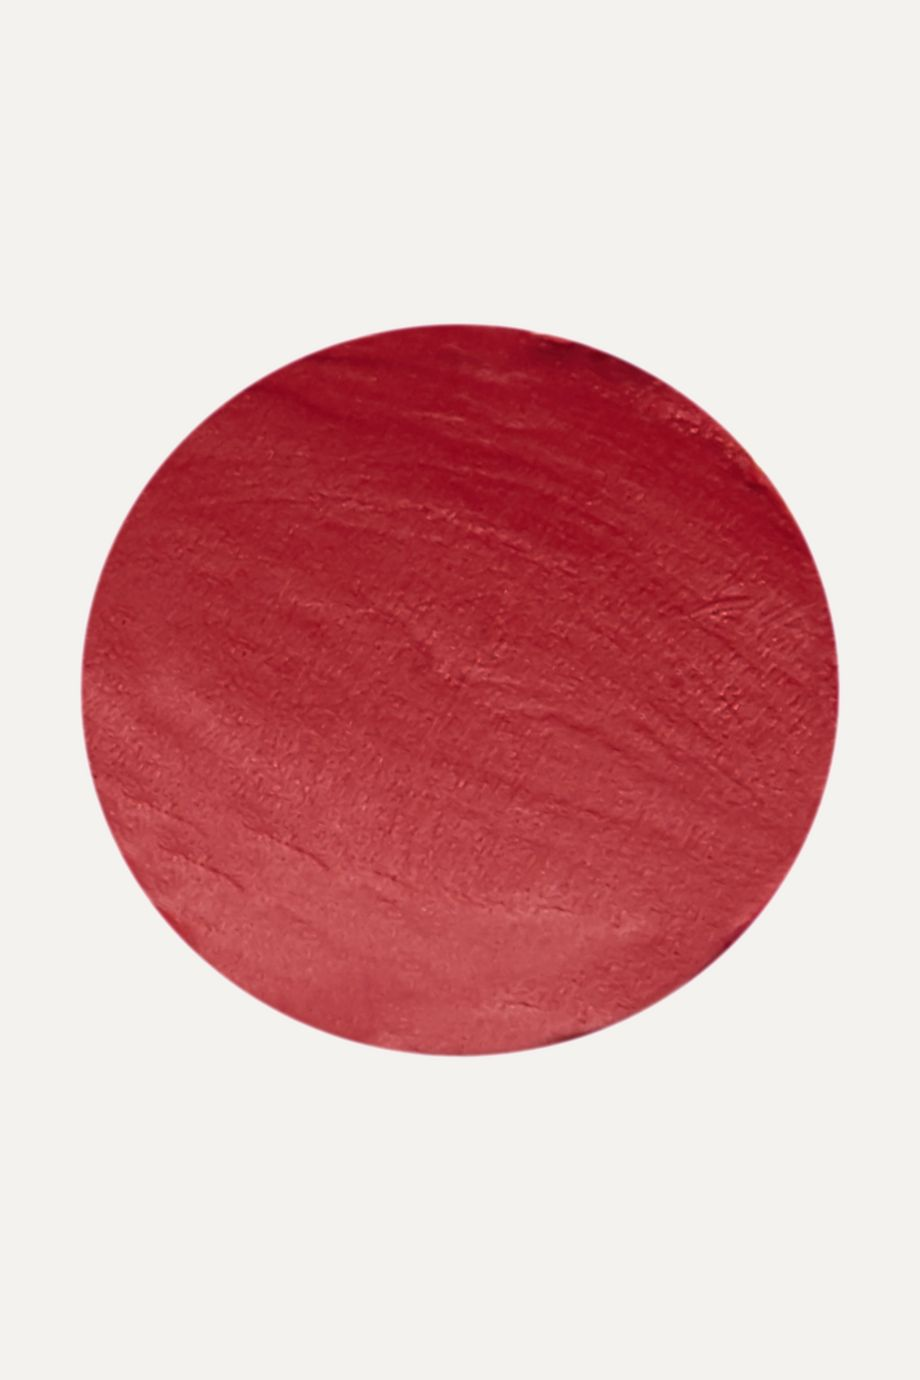 Sisley Le Phyto Rouge Lipstick - 43 Rouge Capri